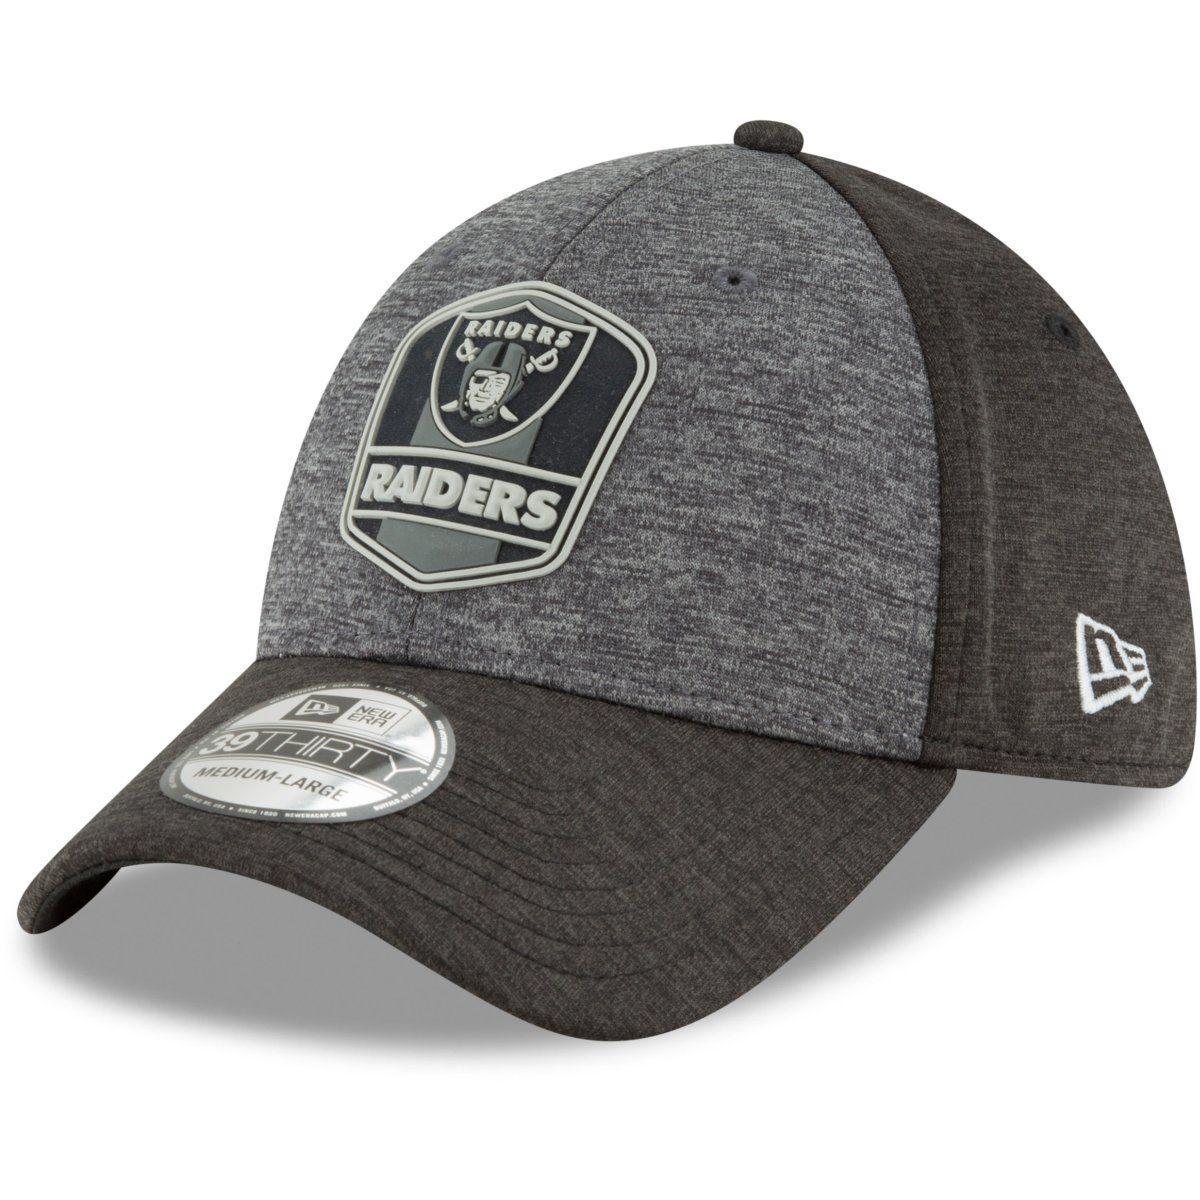 amfoo - New Era 39Thirty Cap - NFL Black Sideline Oakland Raiders